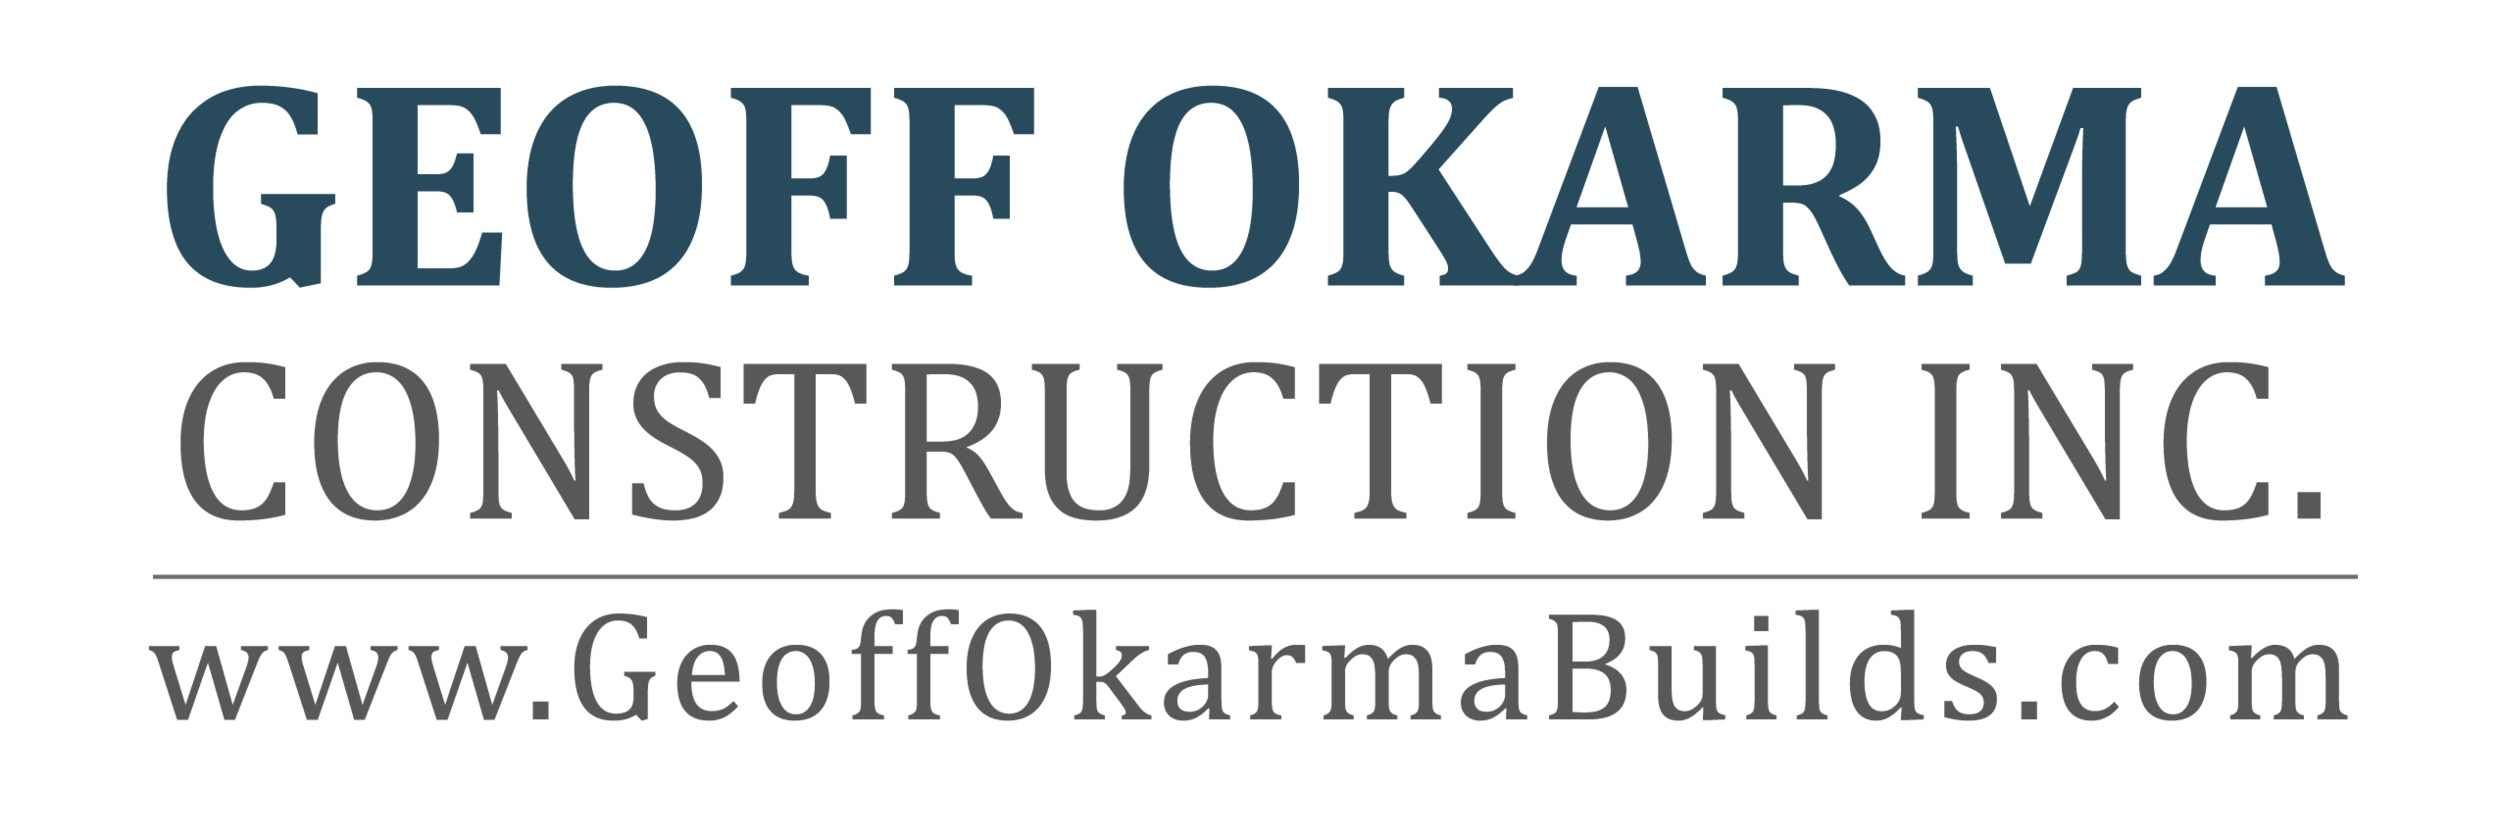 Geoff Okarma Construction, Inc_Final Logo_Final Logo.png